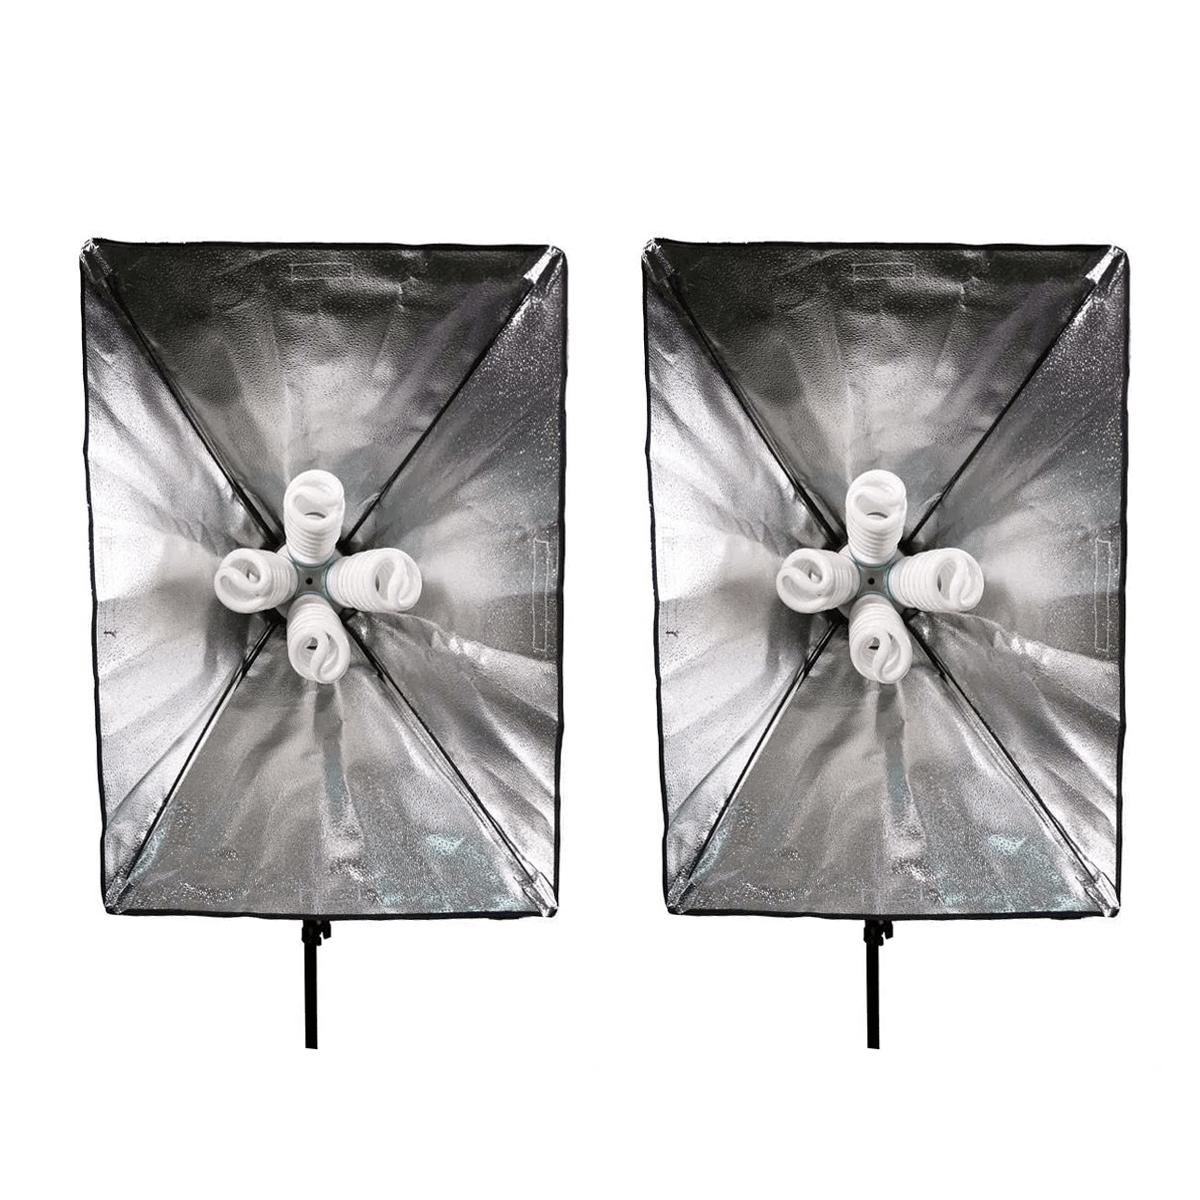 Kit de Iluminação Luz Contínua Atena PK-SB01 para Estúdio Fotográfico  - Fotolux